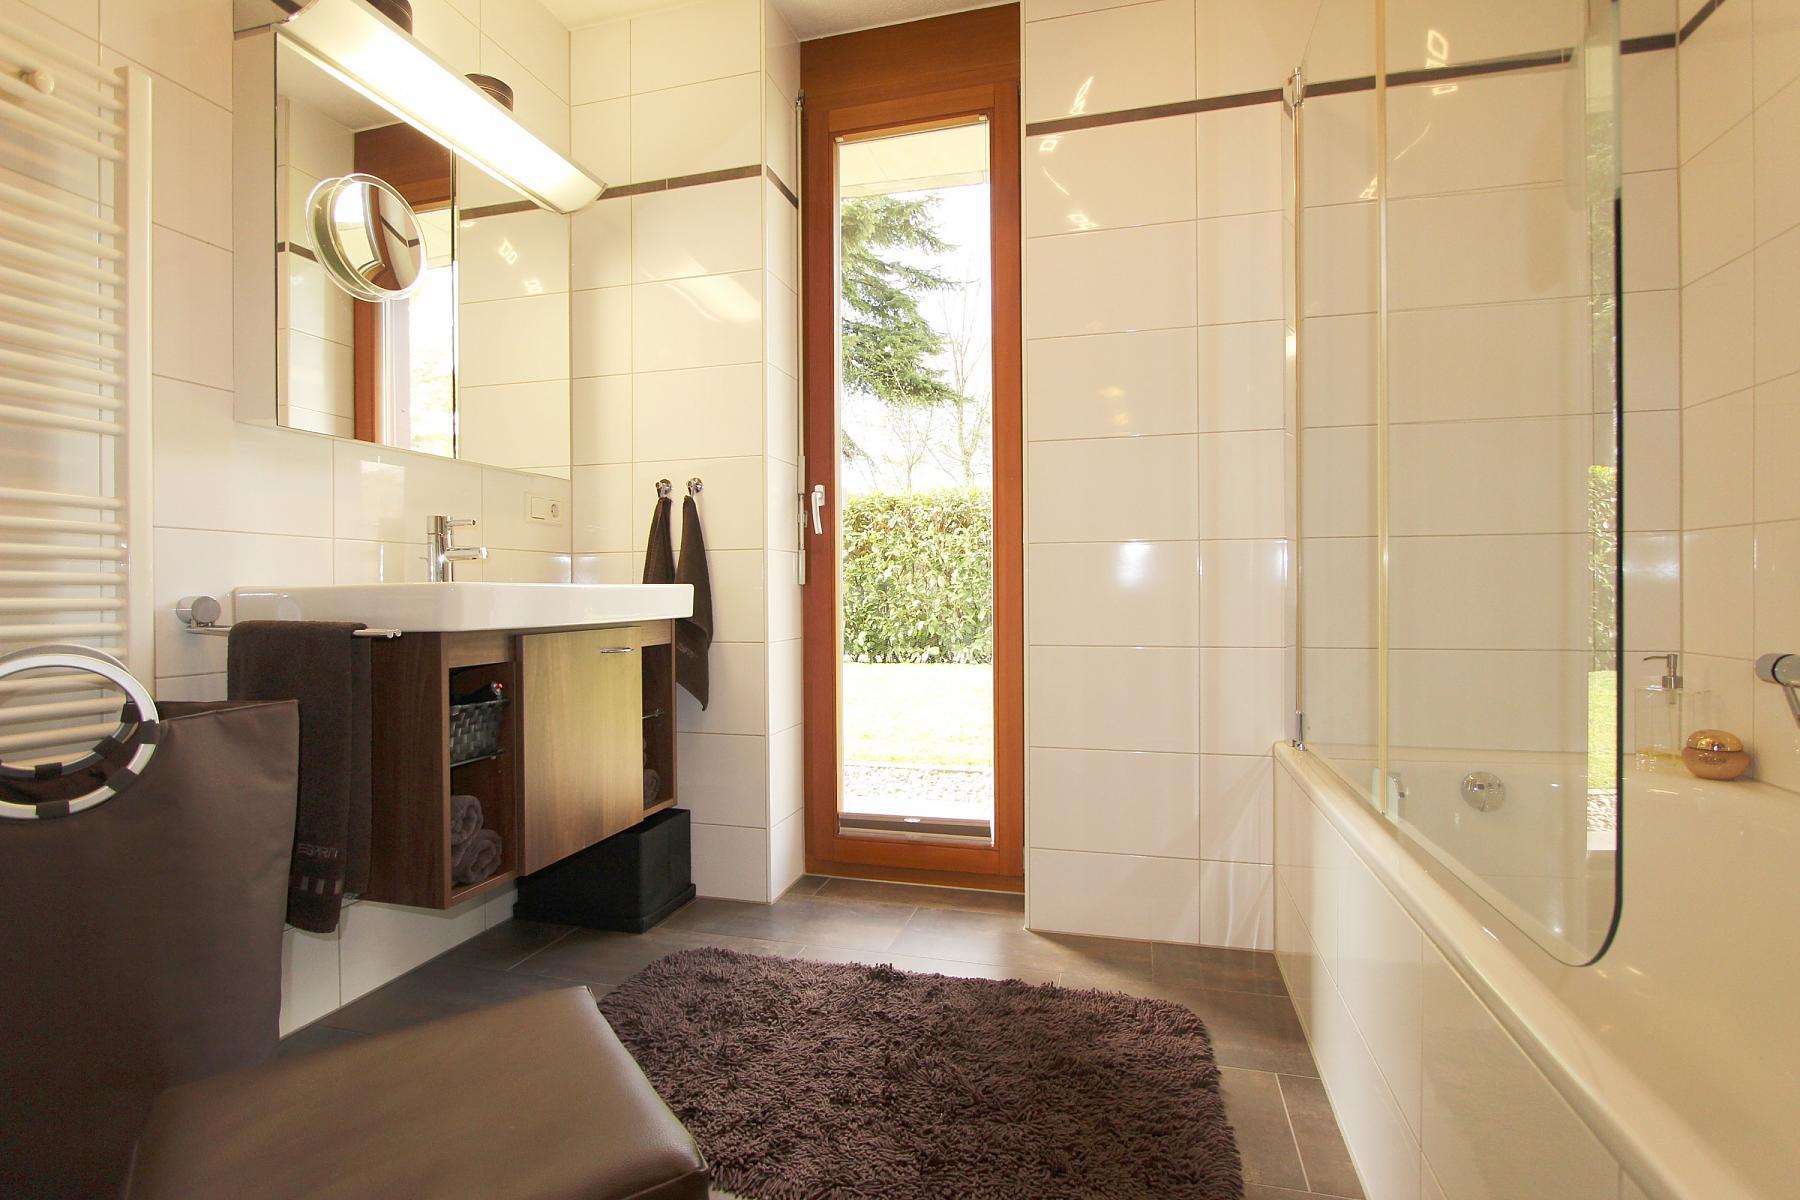 immobilie lochau smart home bauconsulting gmbh. Black Bedroom Furniture Sets. Home Design Ideas